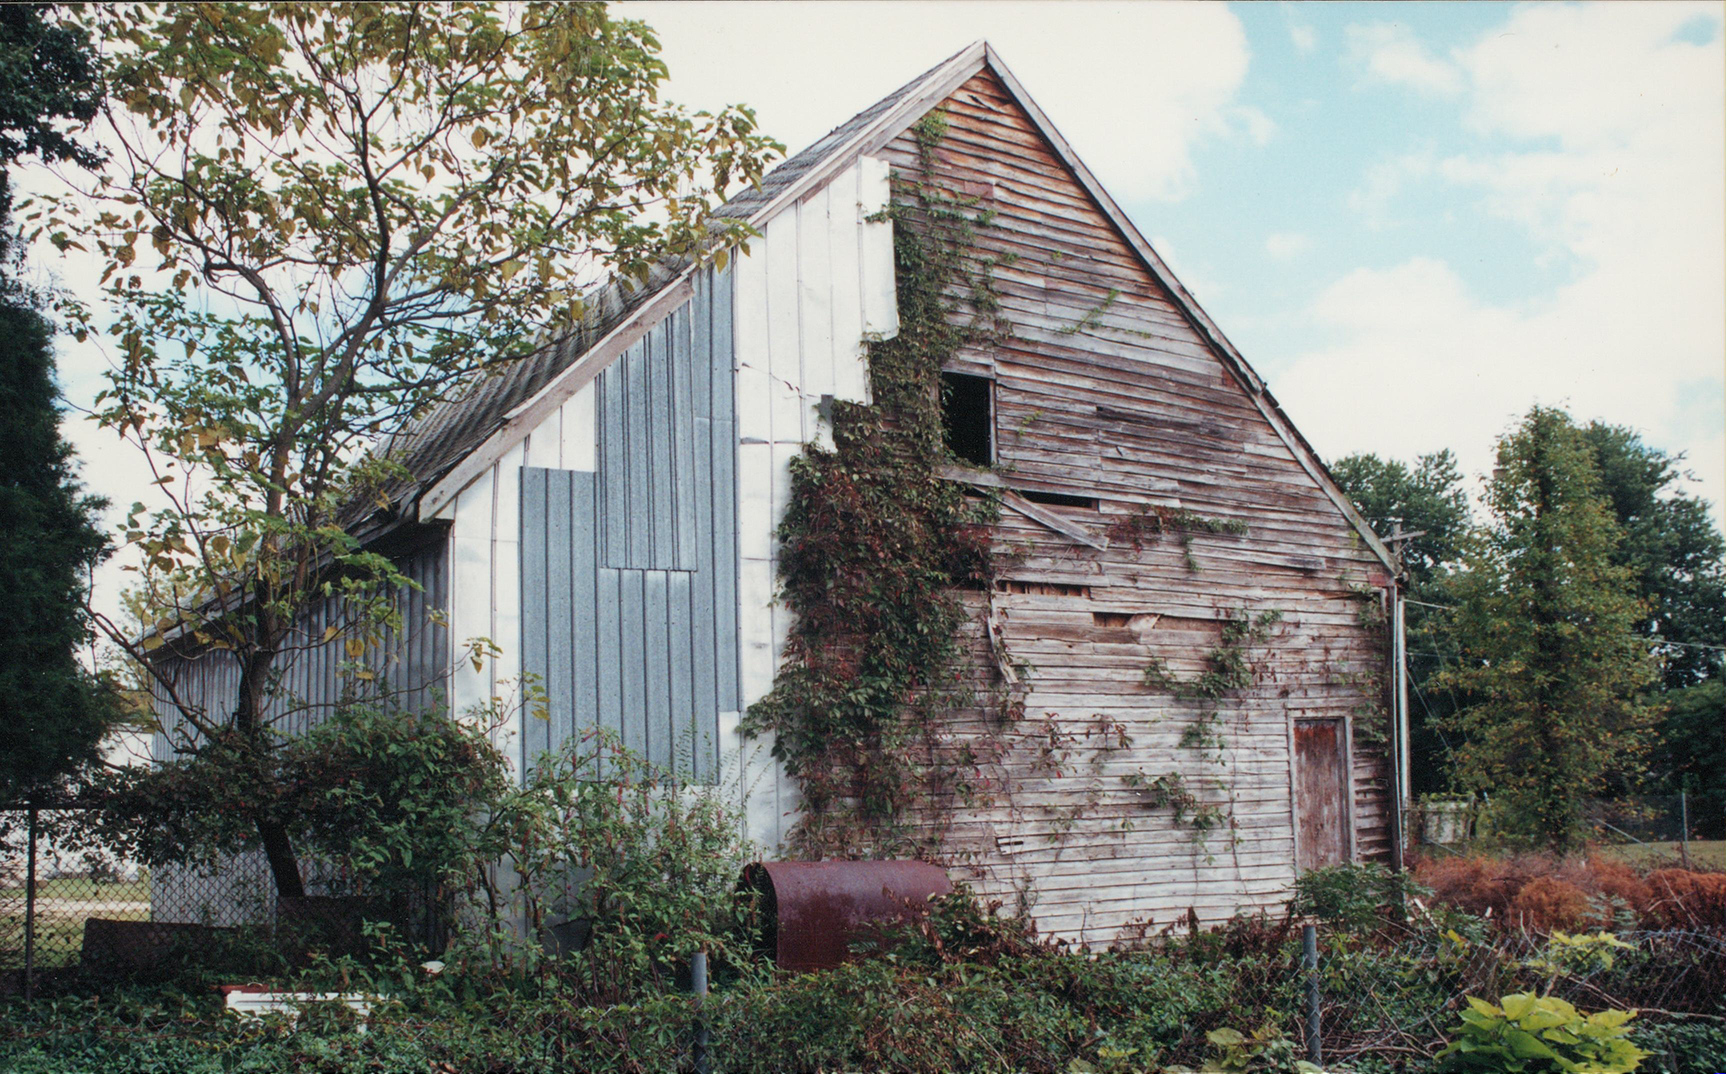 A view of a historic barn near Denton, Maryland.